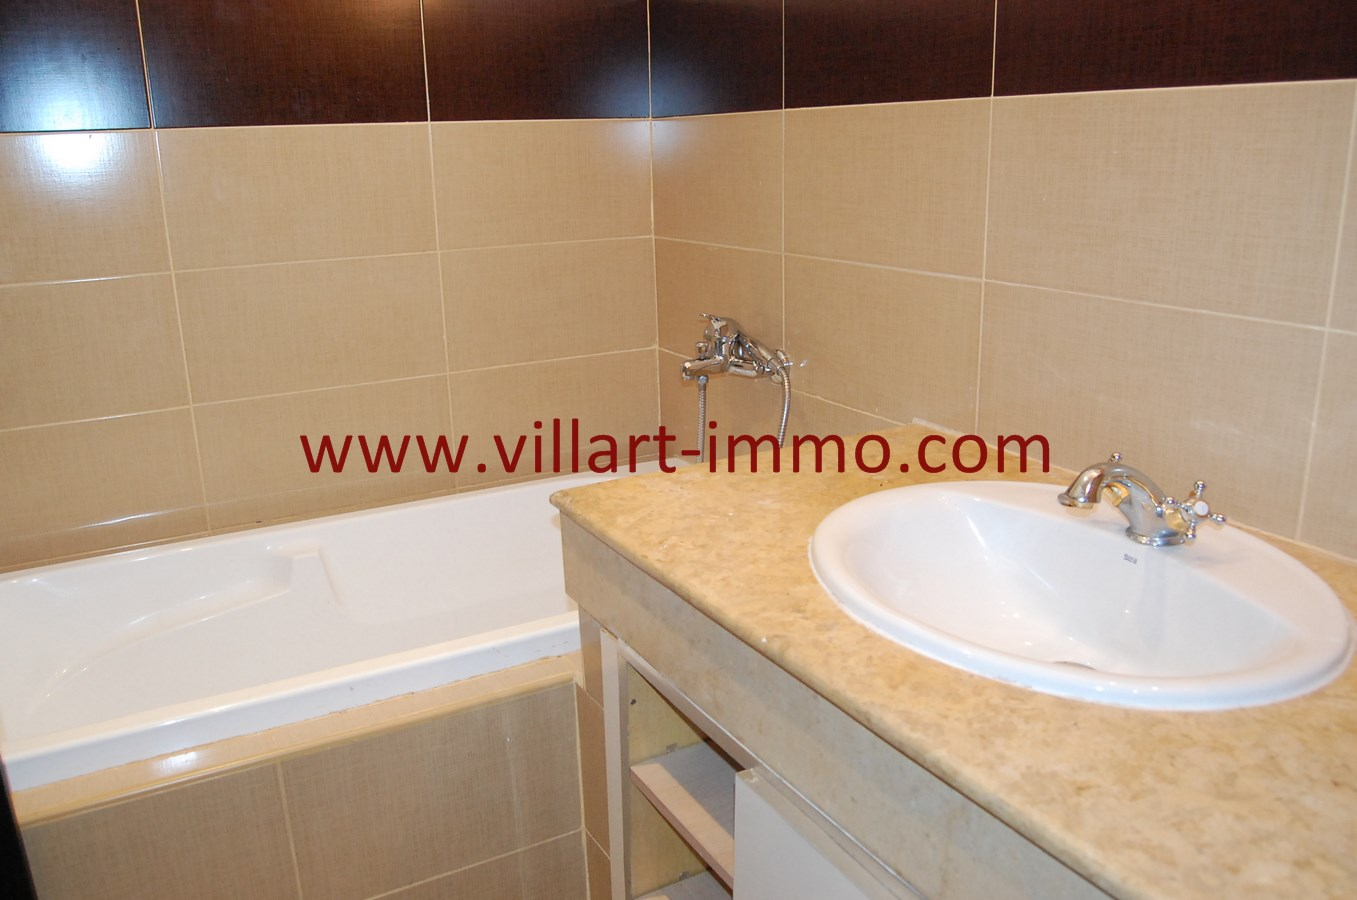 10-Vente-Appartement-Tanger-Salle de Bain 2-VA480-Villart Immo